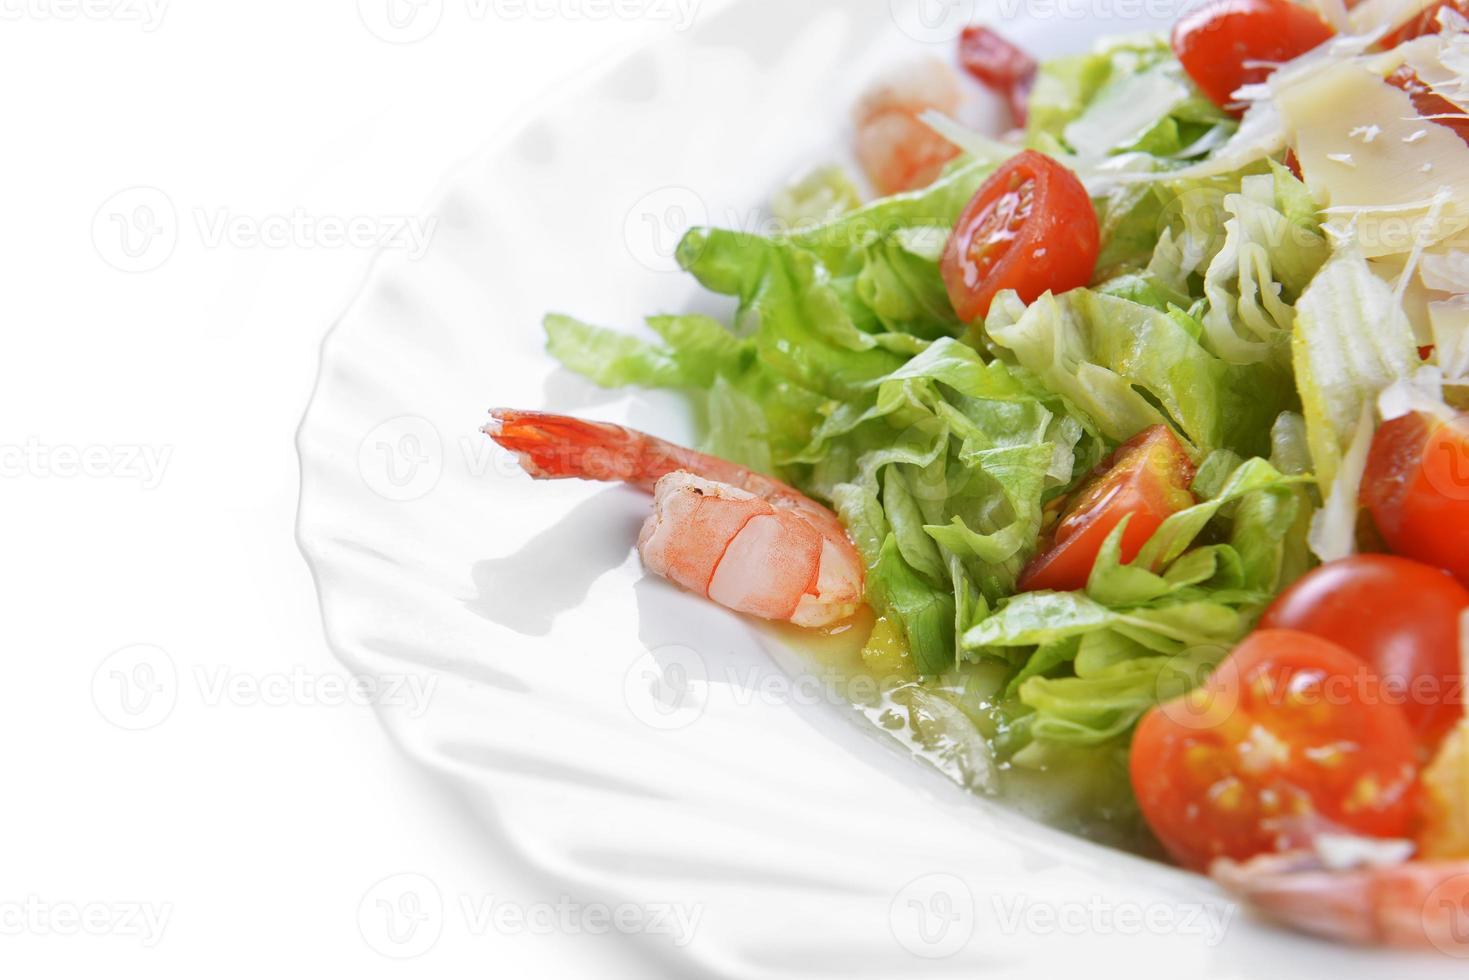 salade aux fruits de mer photo